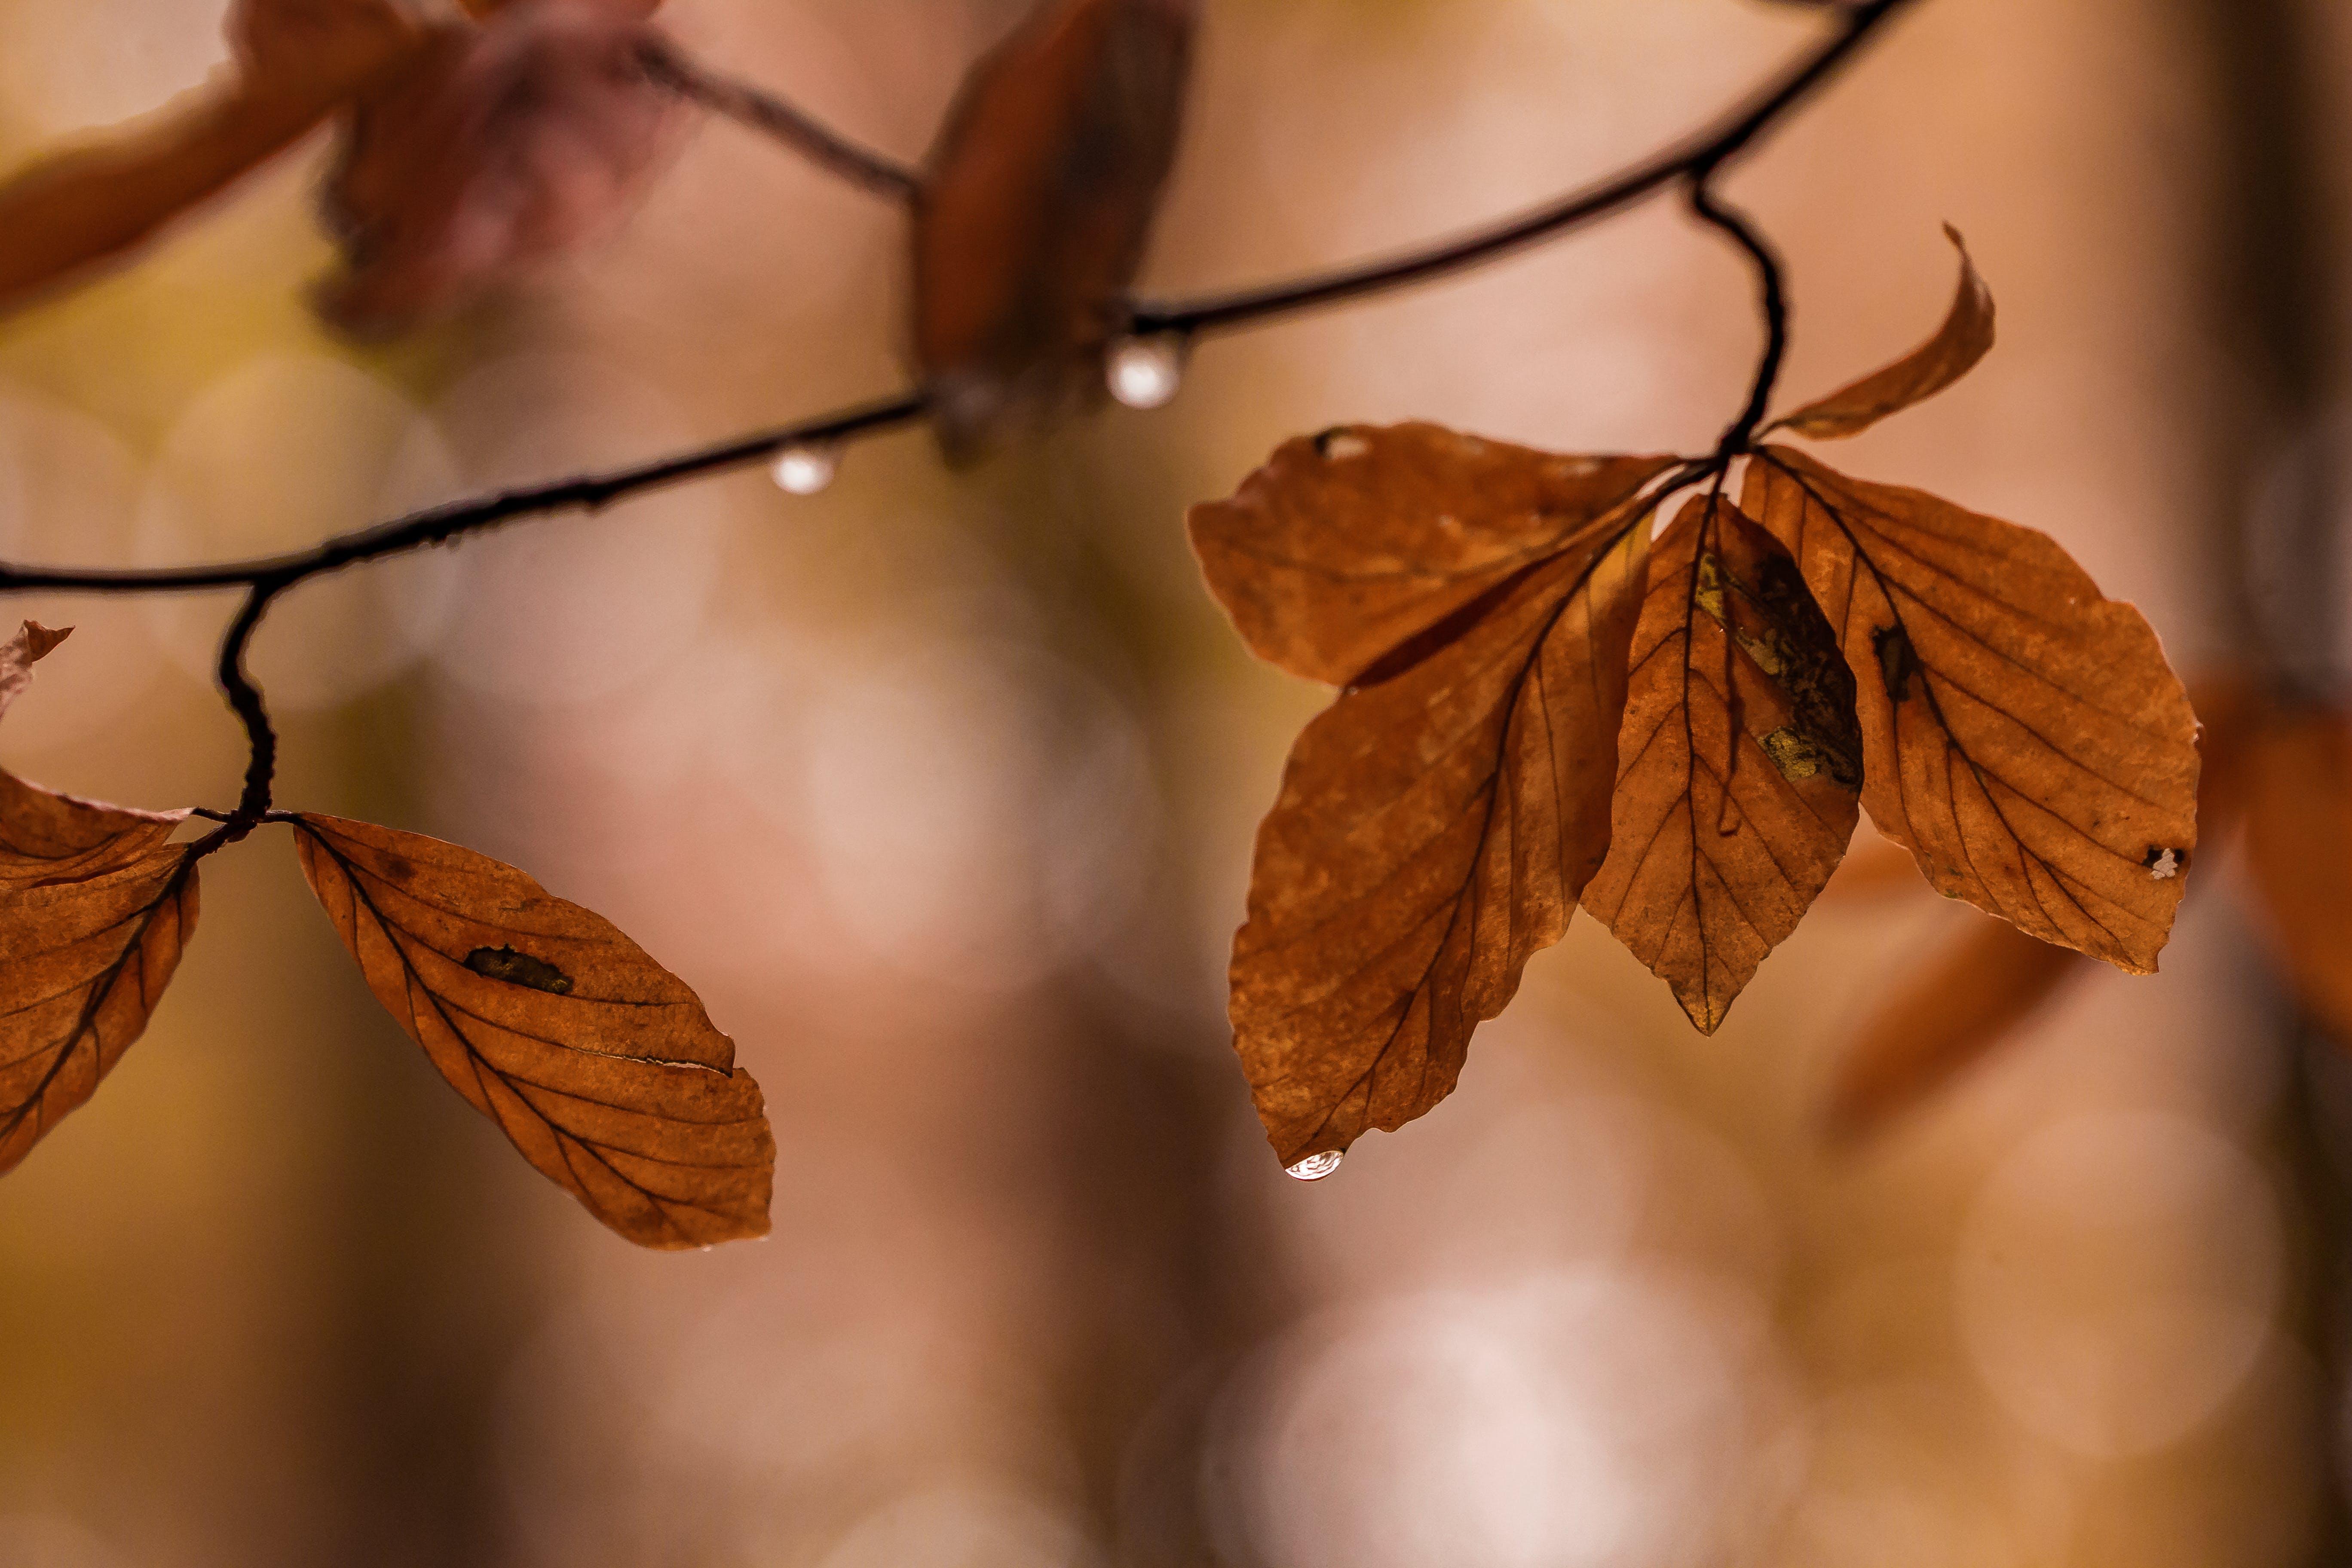 Brown Leaf on Shallow Focus Lens